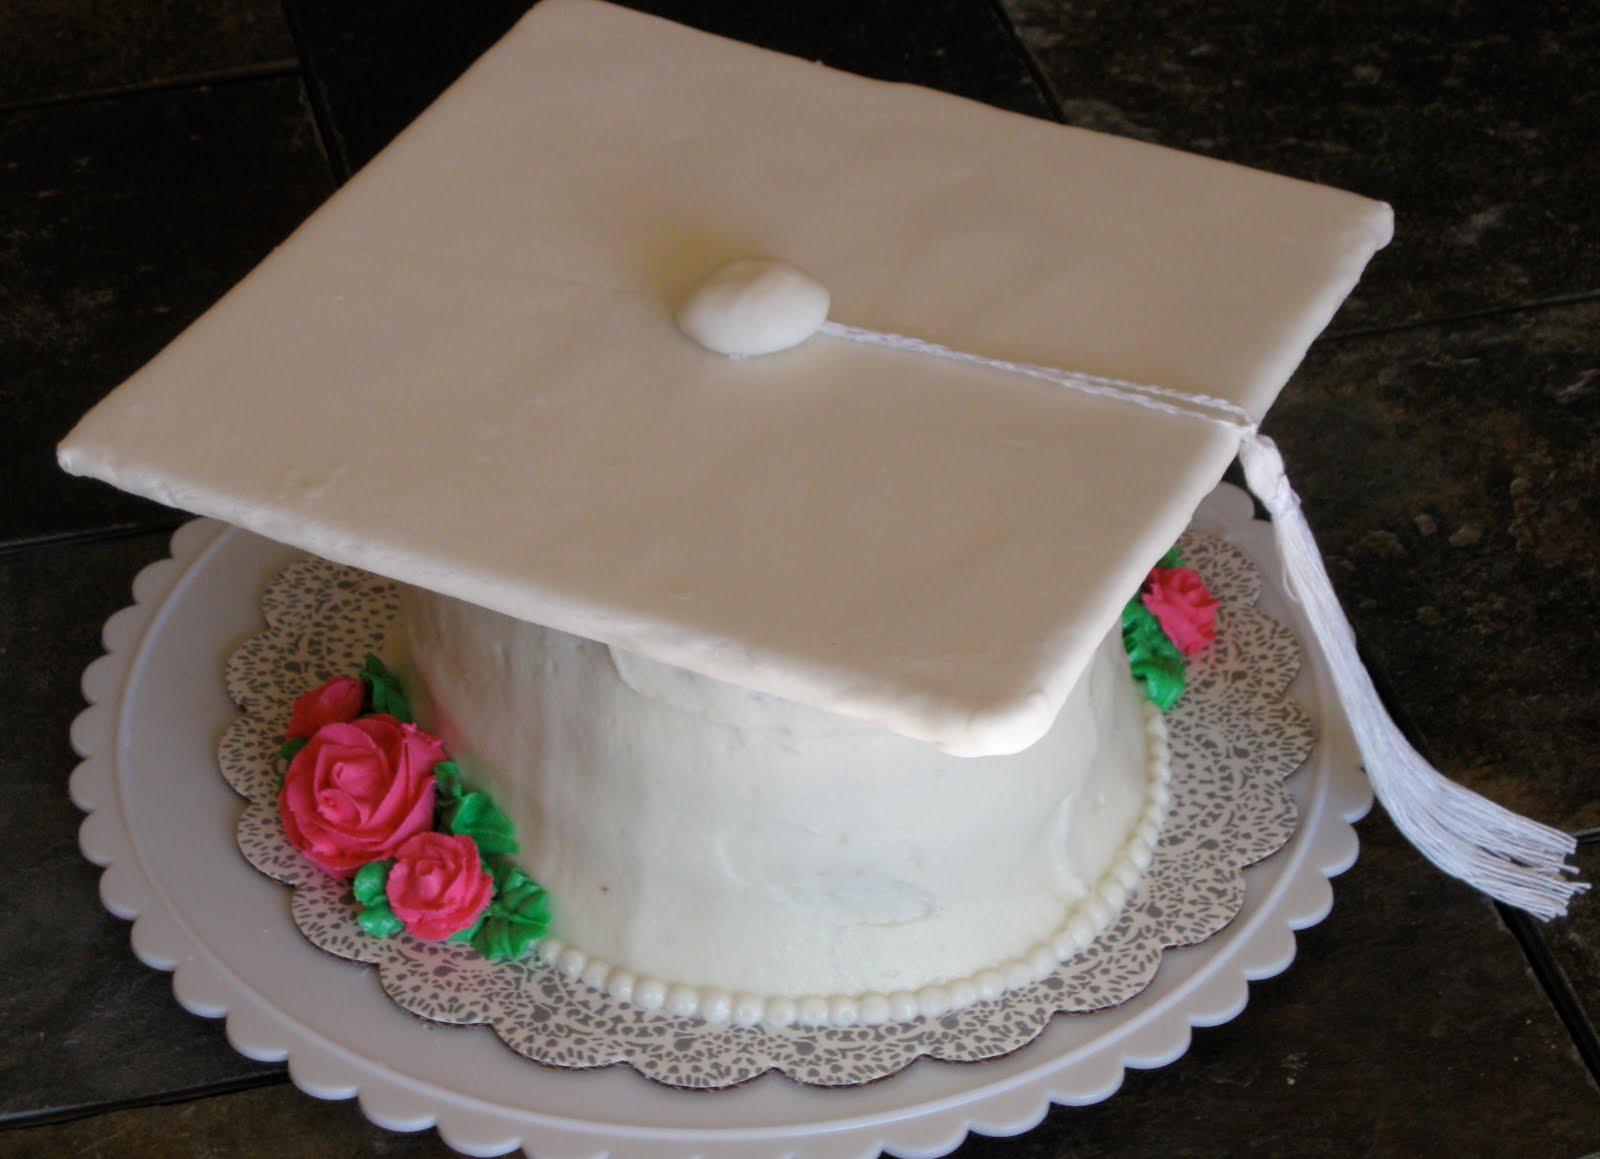 Graduation Cake Recipes Pictures : Cattapan s Cookies & Cakes: Graduation Cap Cake